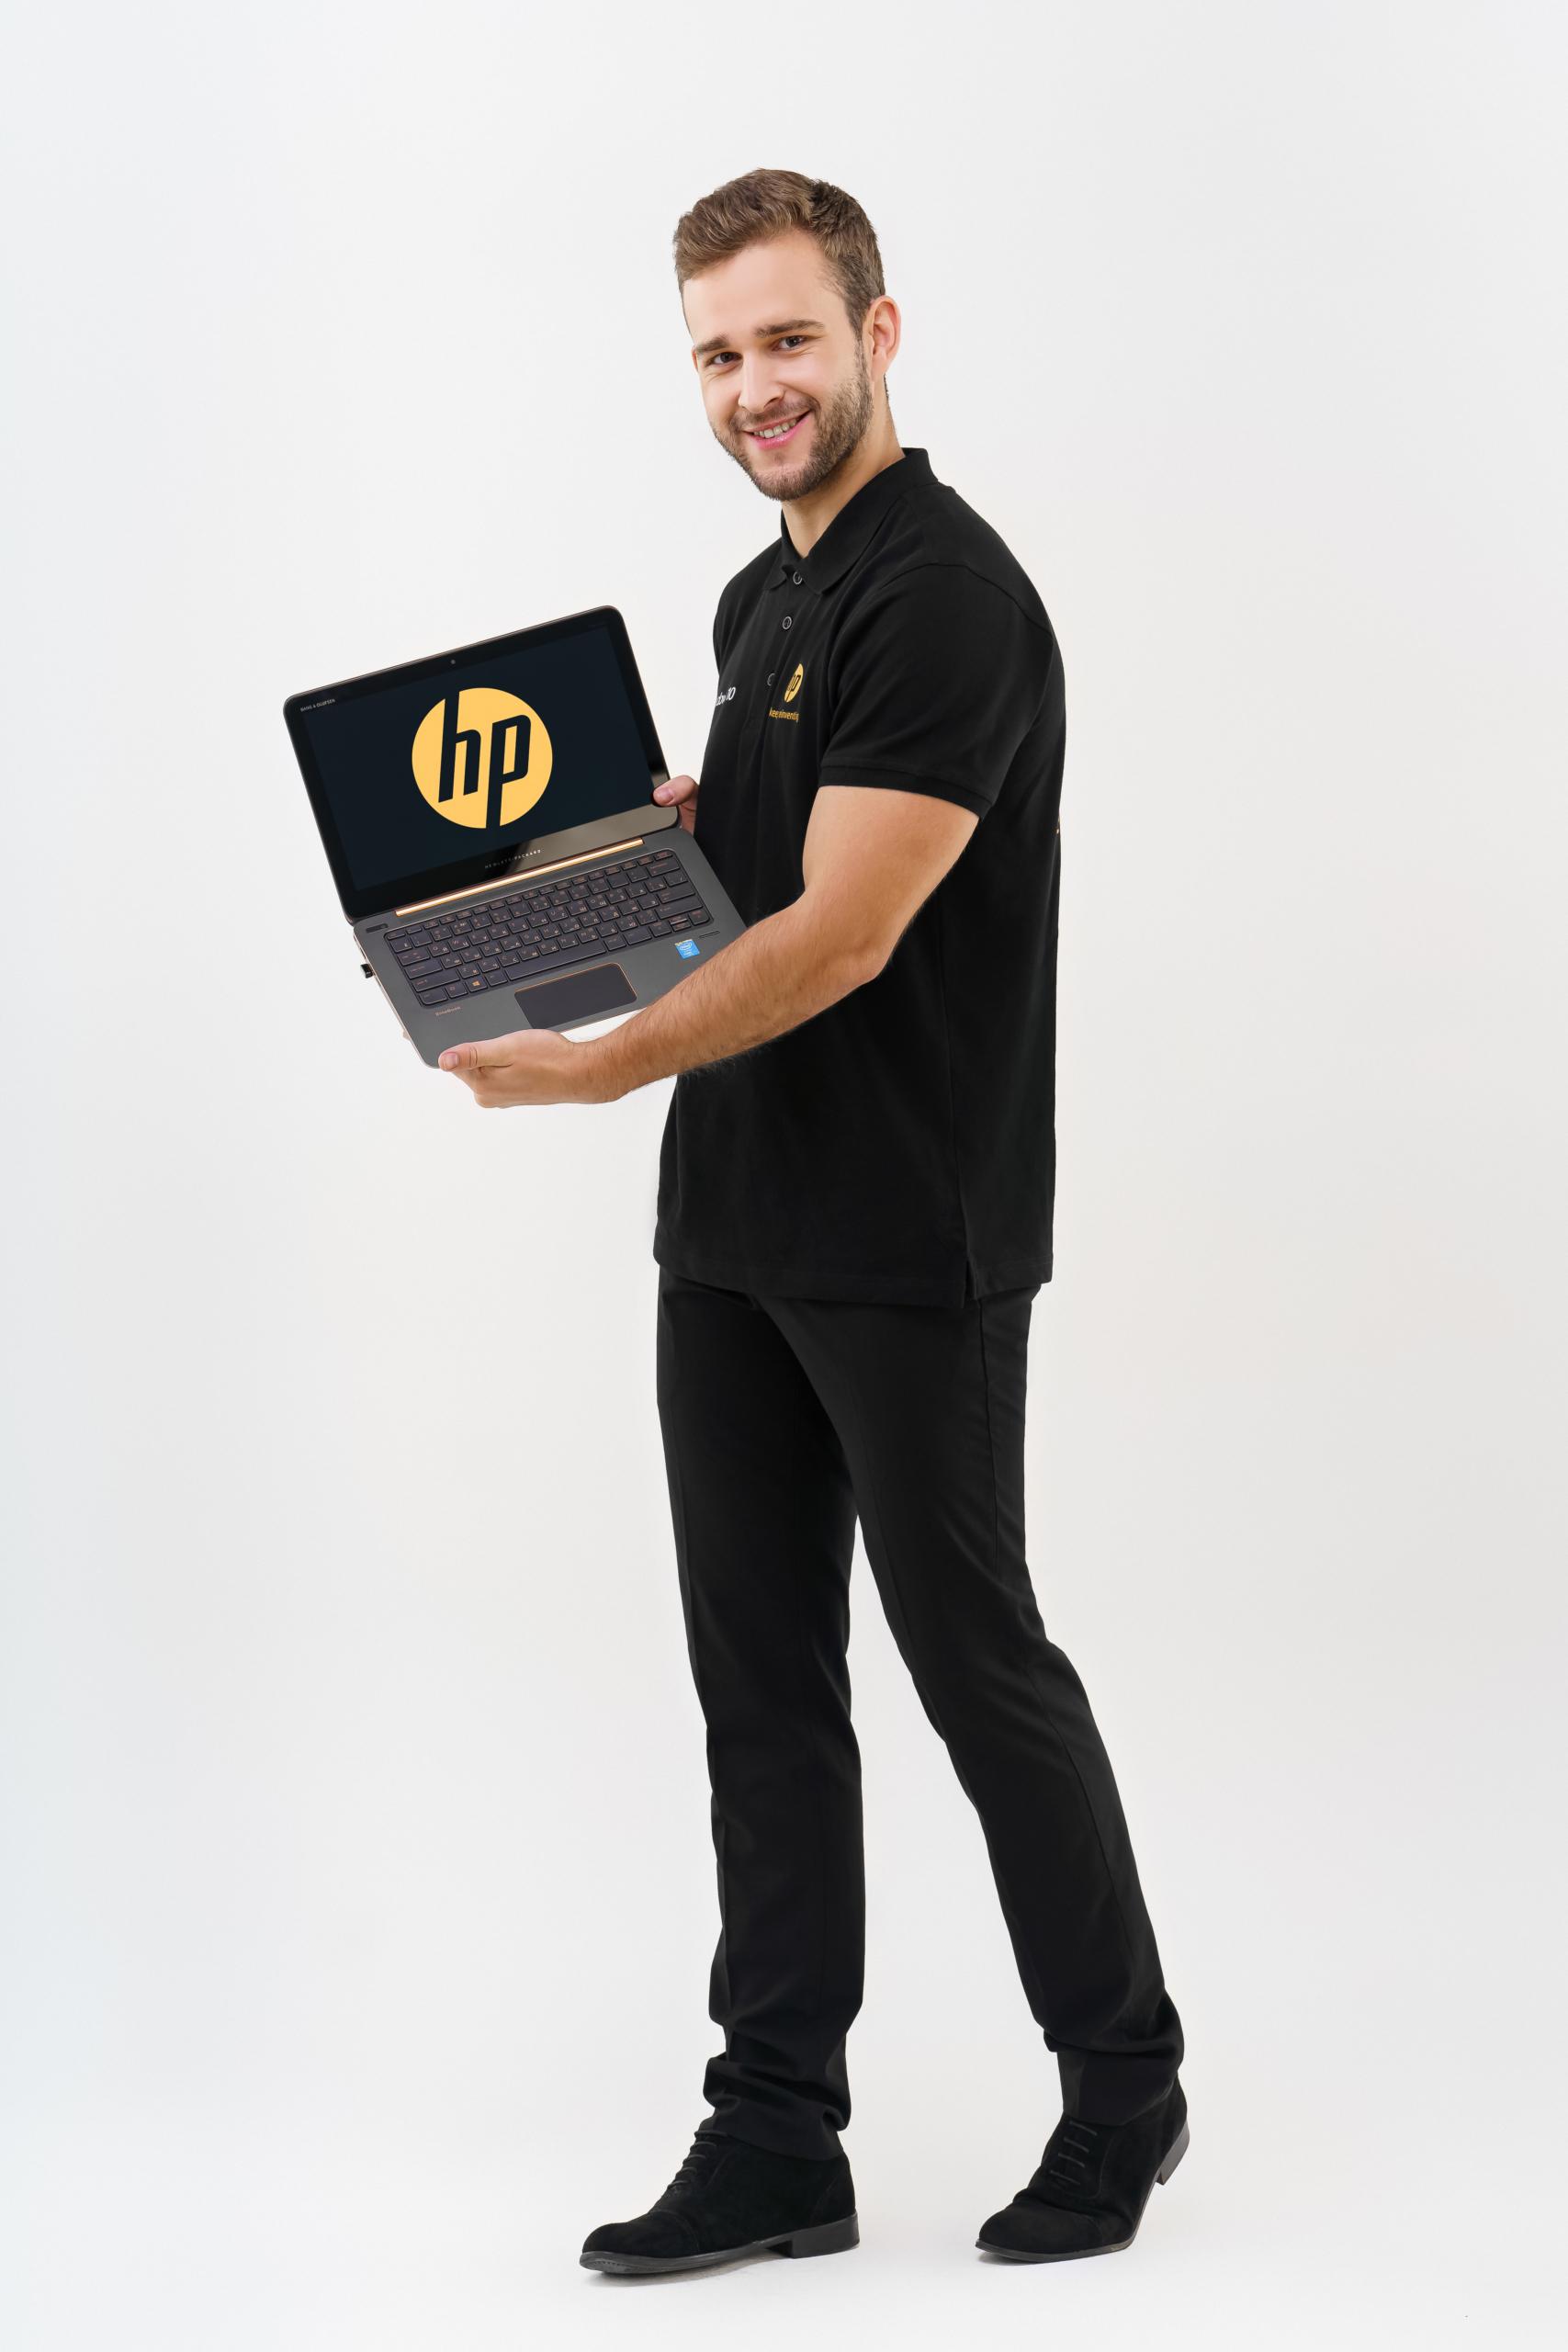 PHOTO PPL Бизнес-Портрет